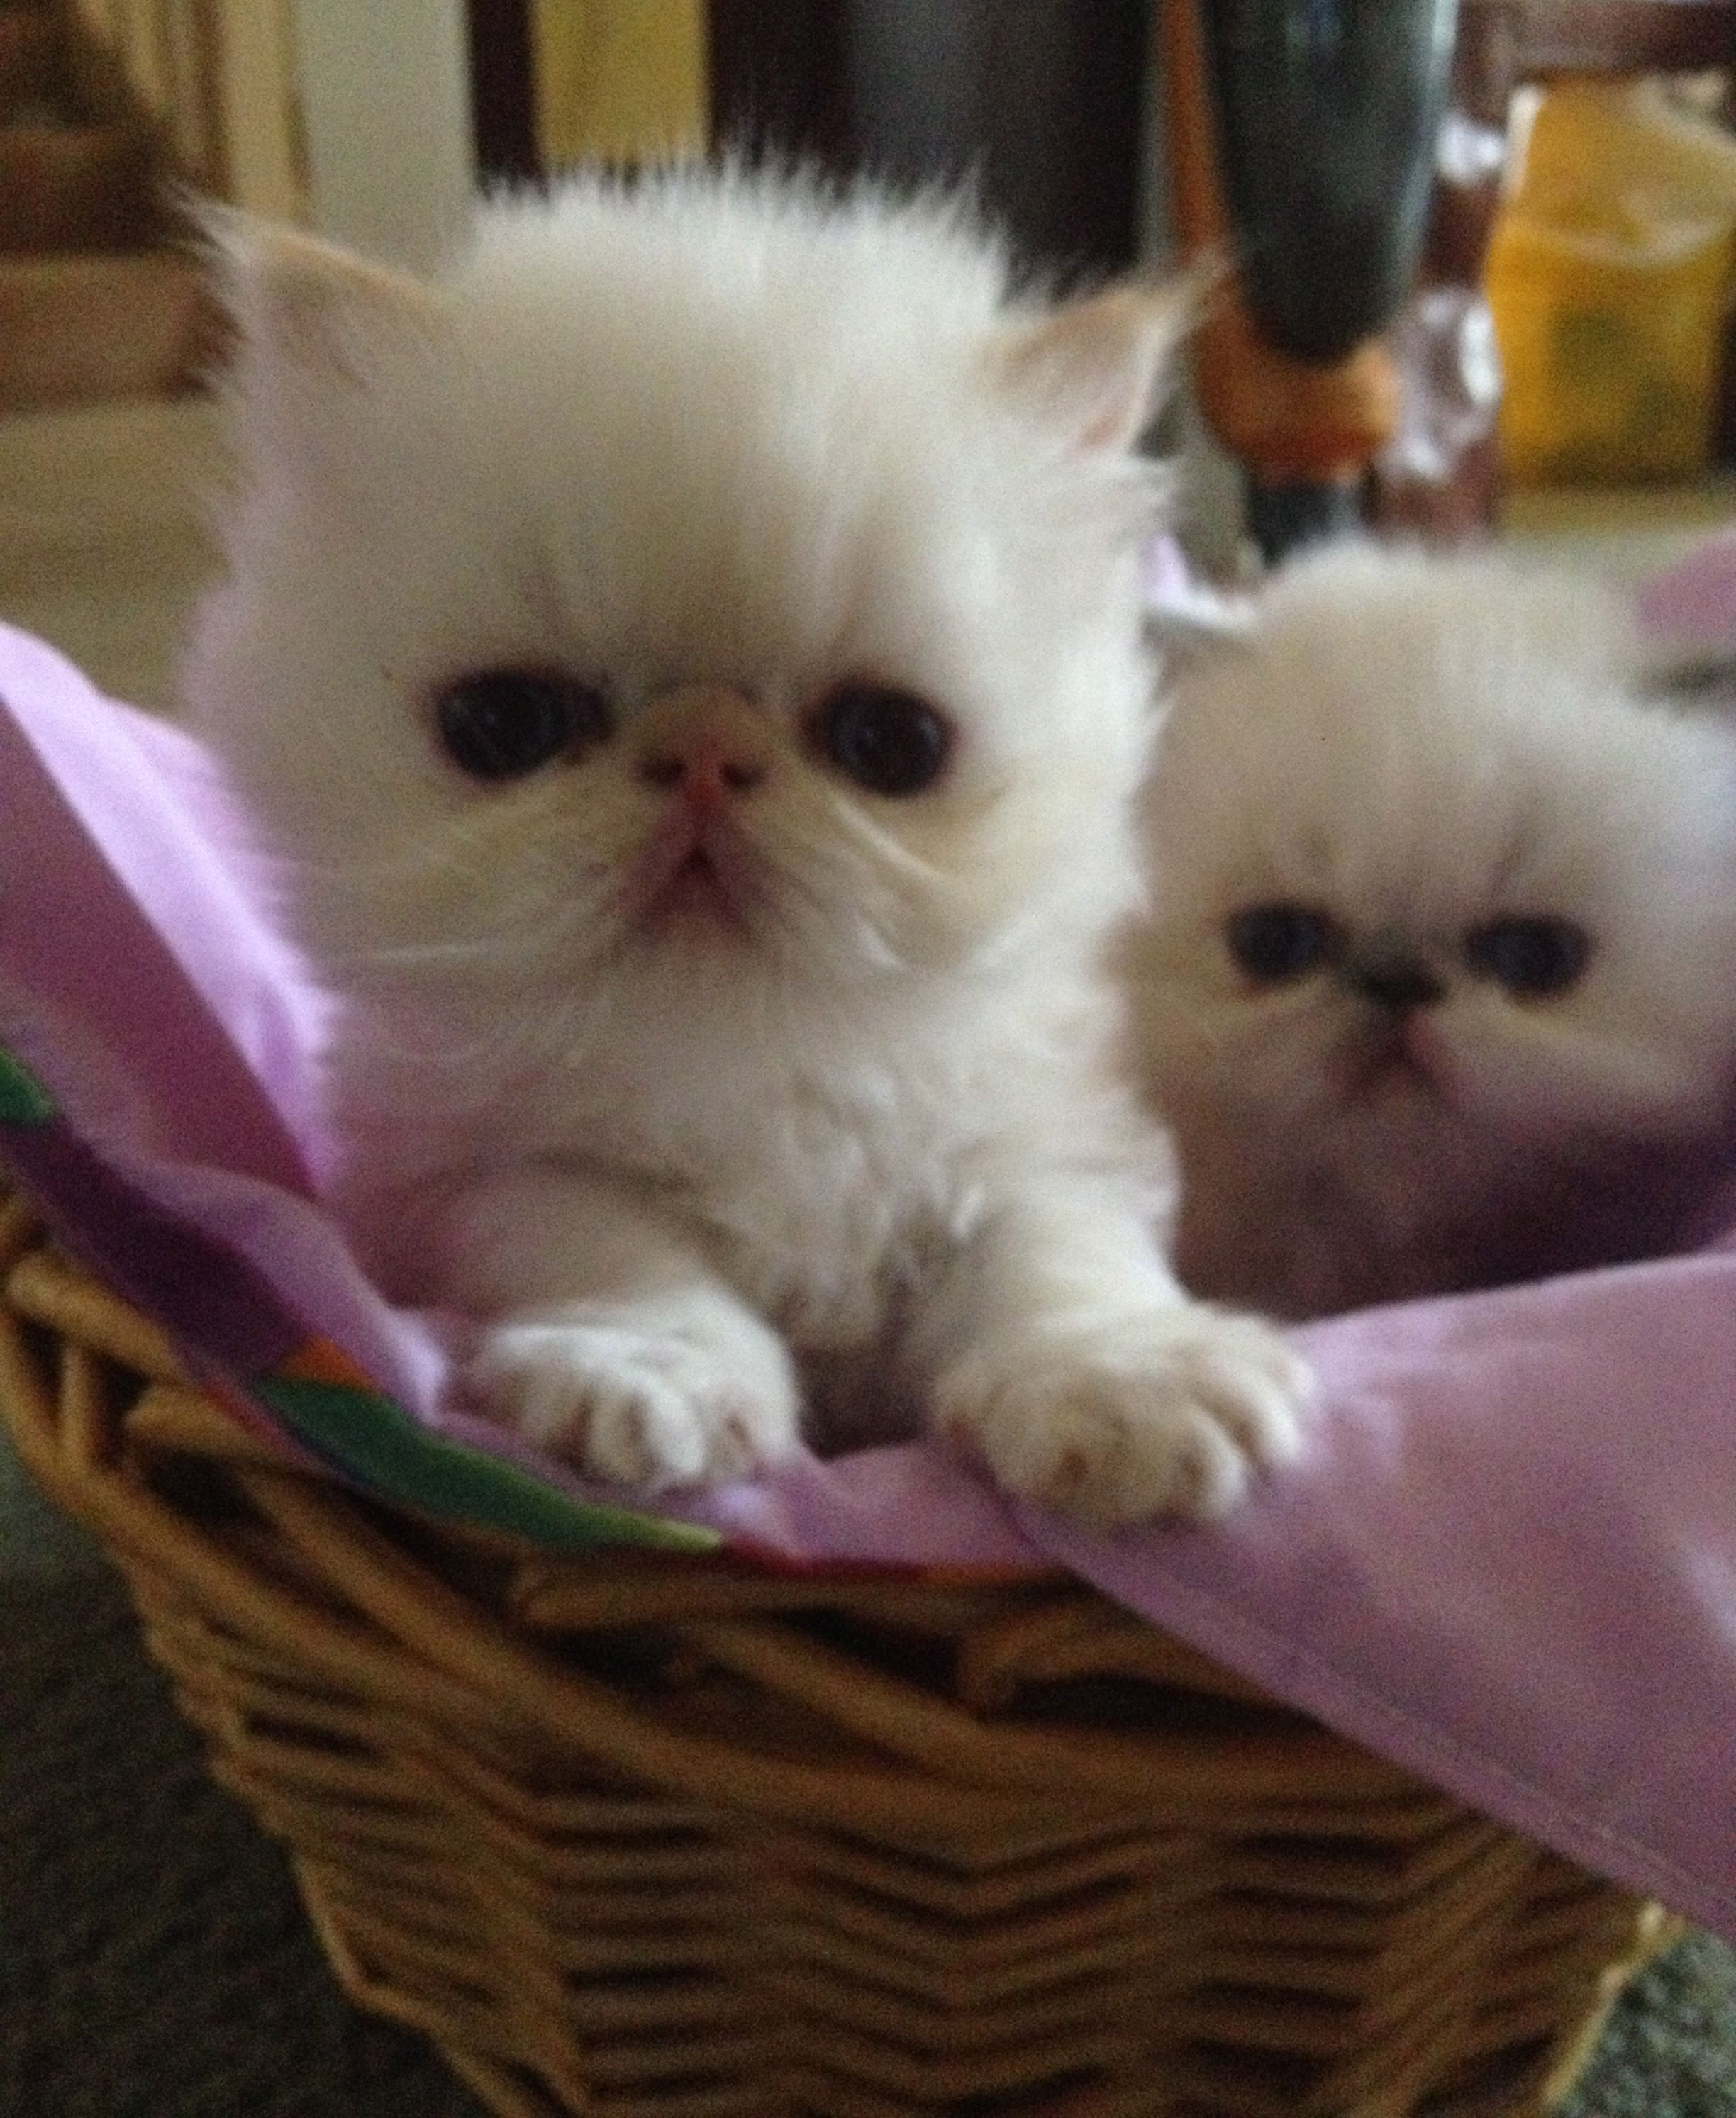 Himalayan Kittens For Sale Sydney Australia See Our Website Www Takatsucattery Com Himalayan Kitten Kittens Persian Kittens